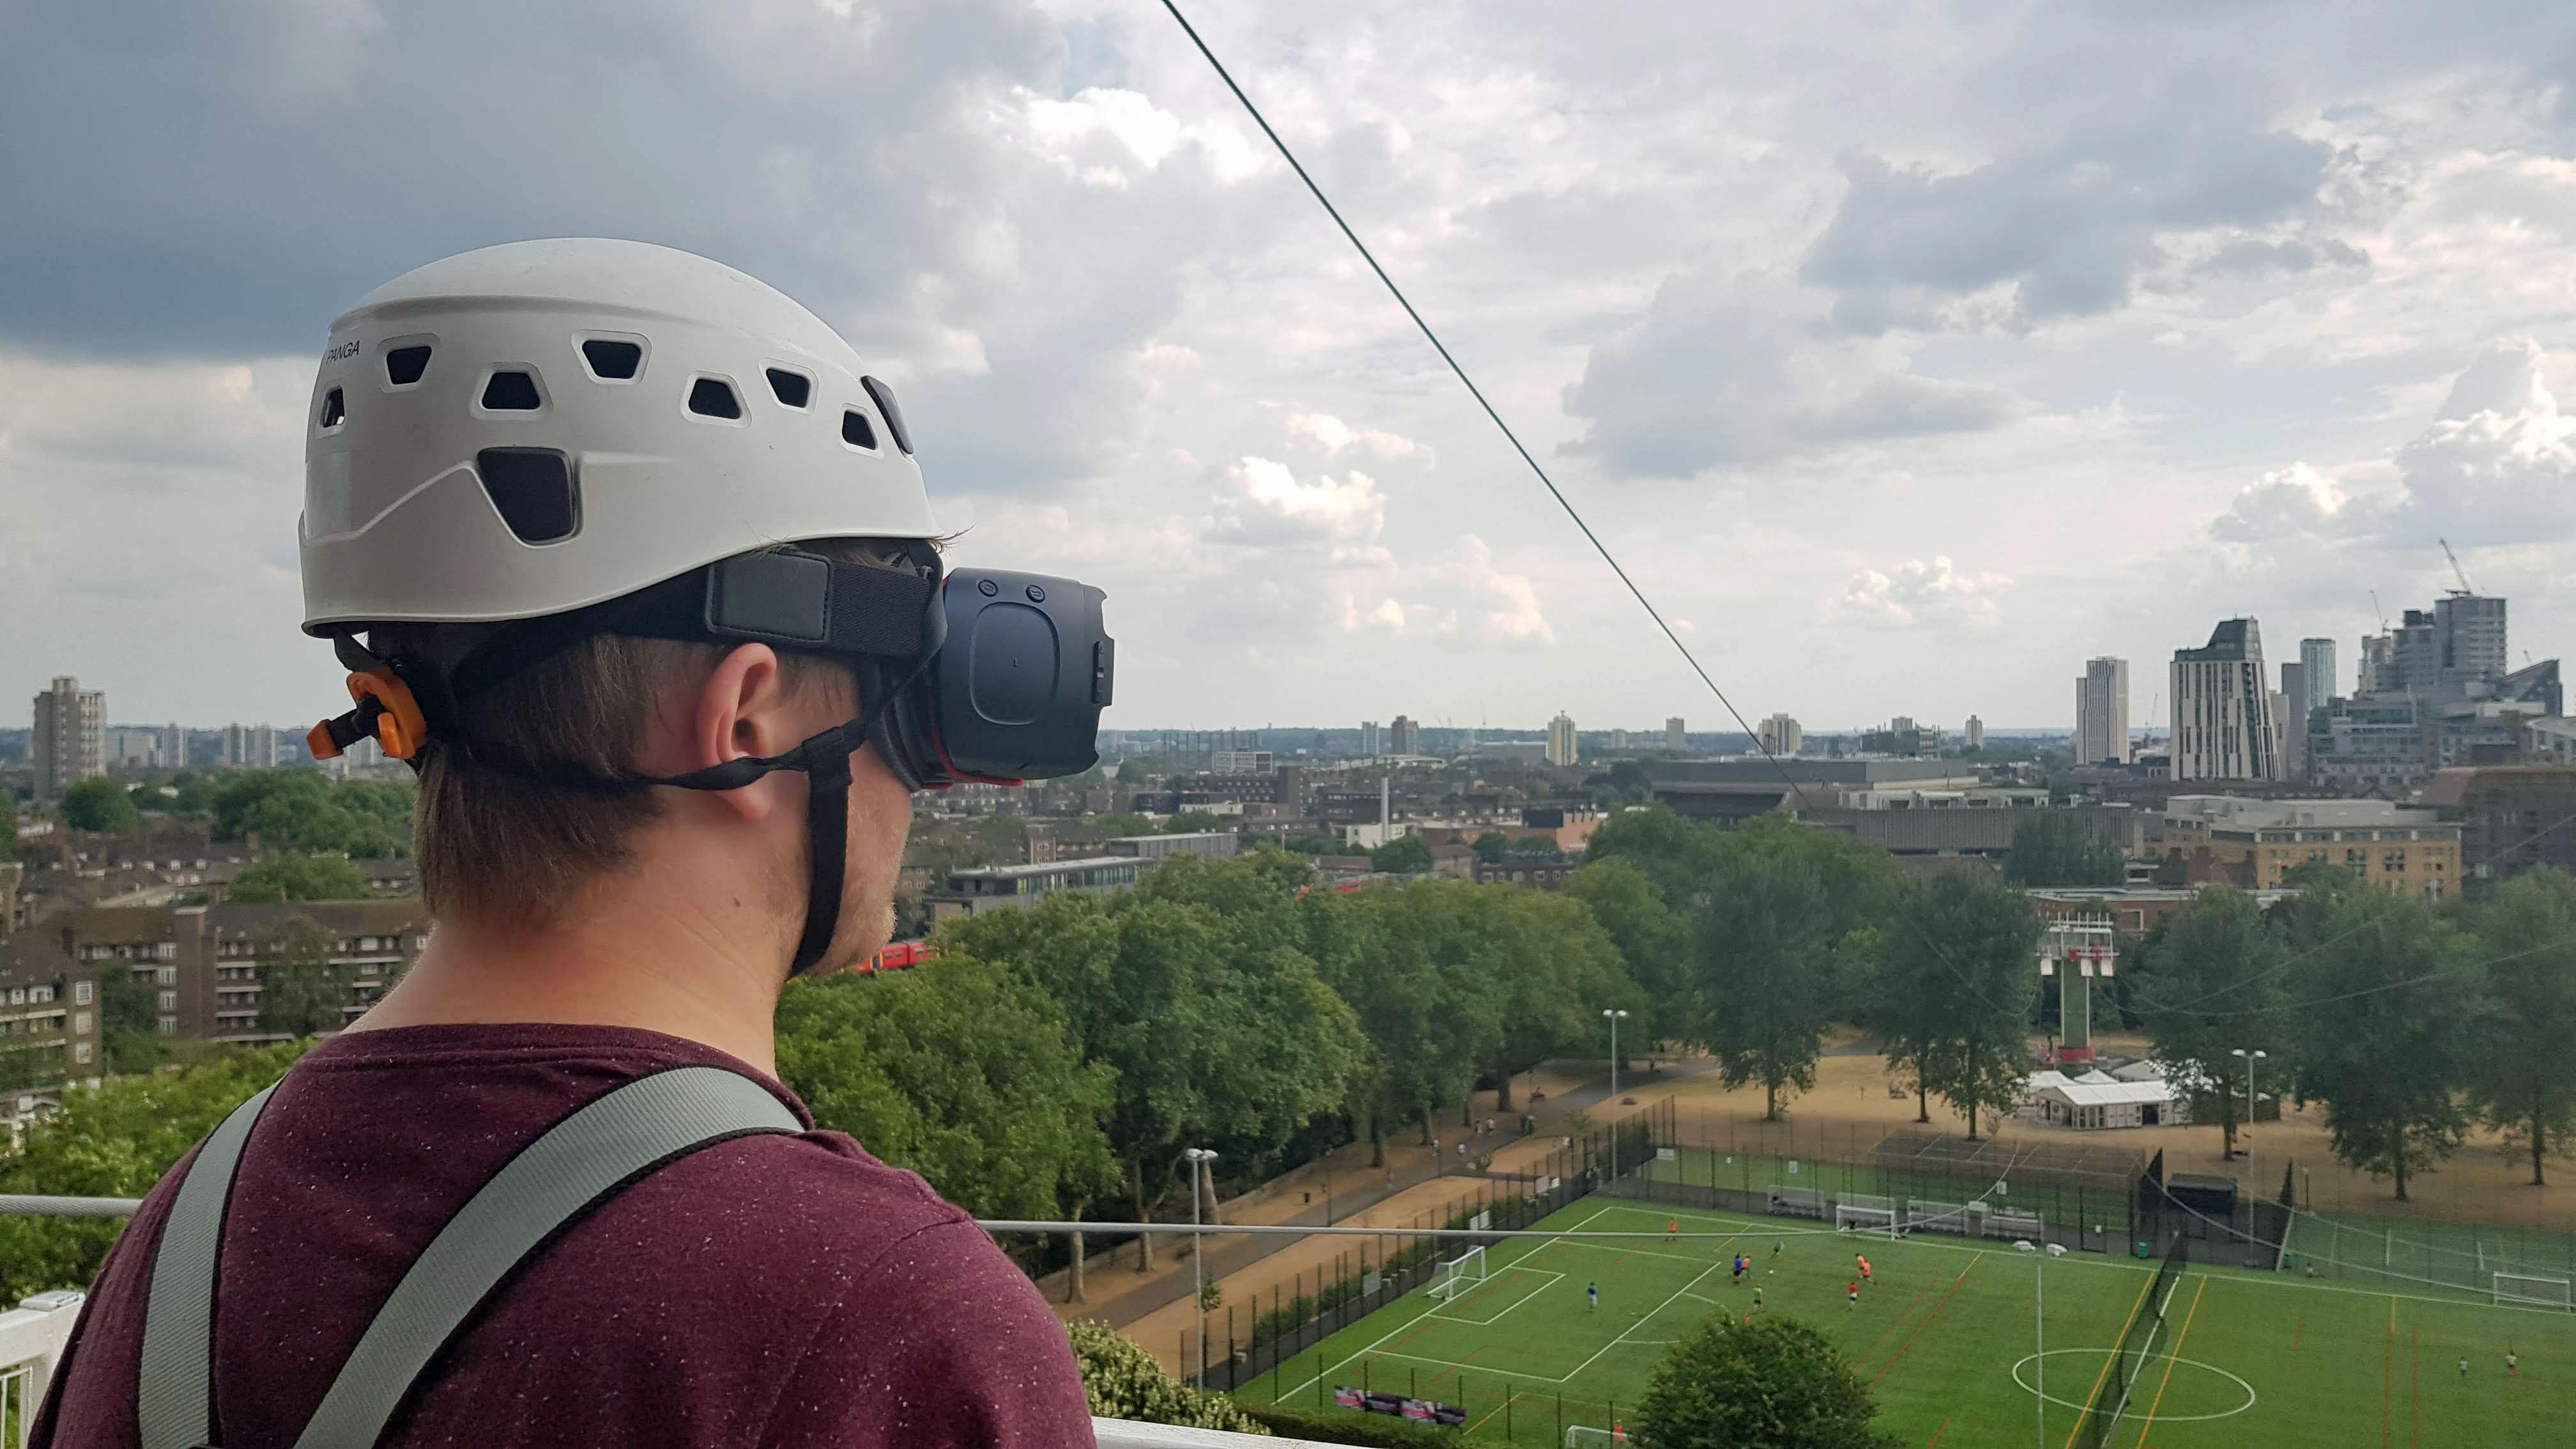 I rode half of the world\'s longest zipline in virtual reality ...